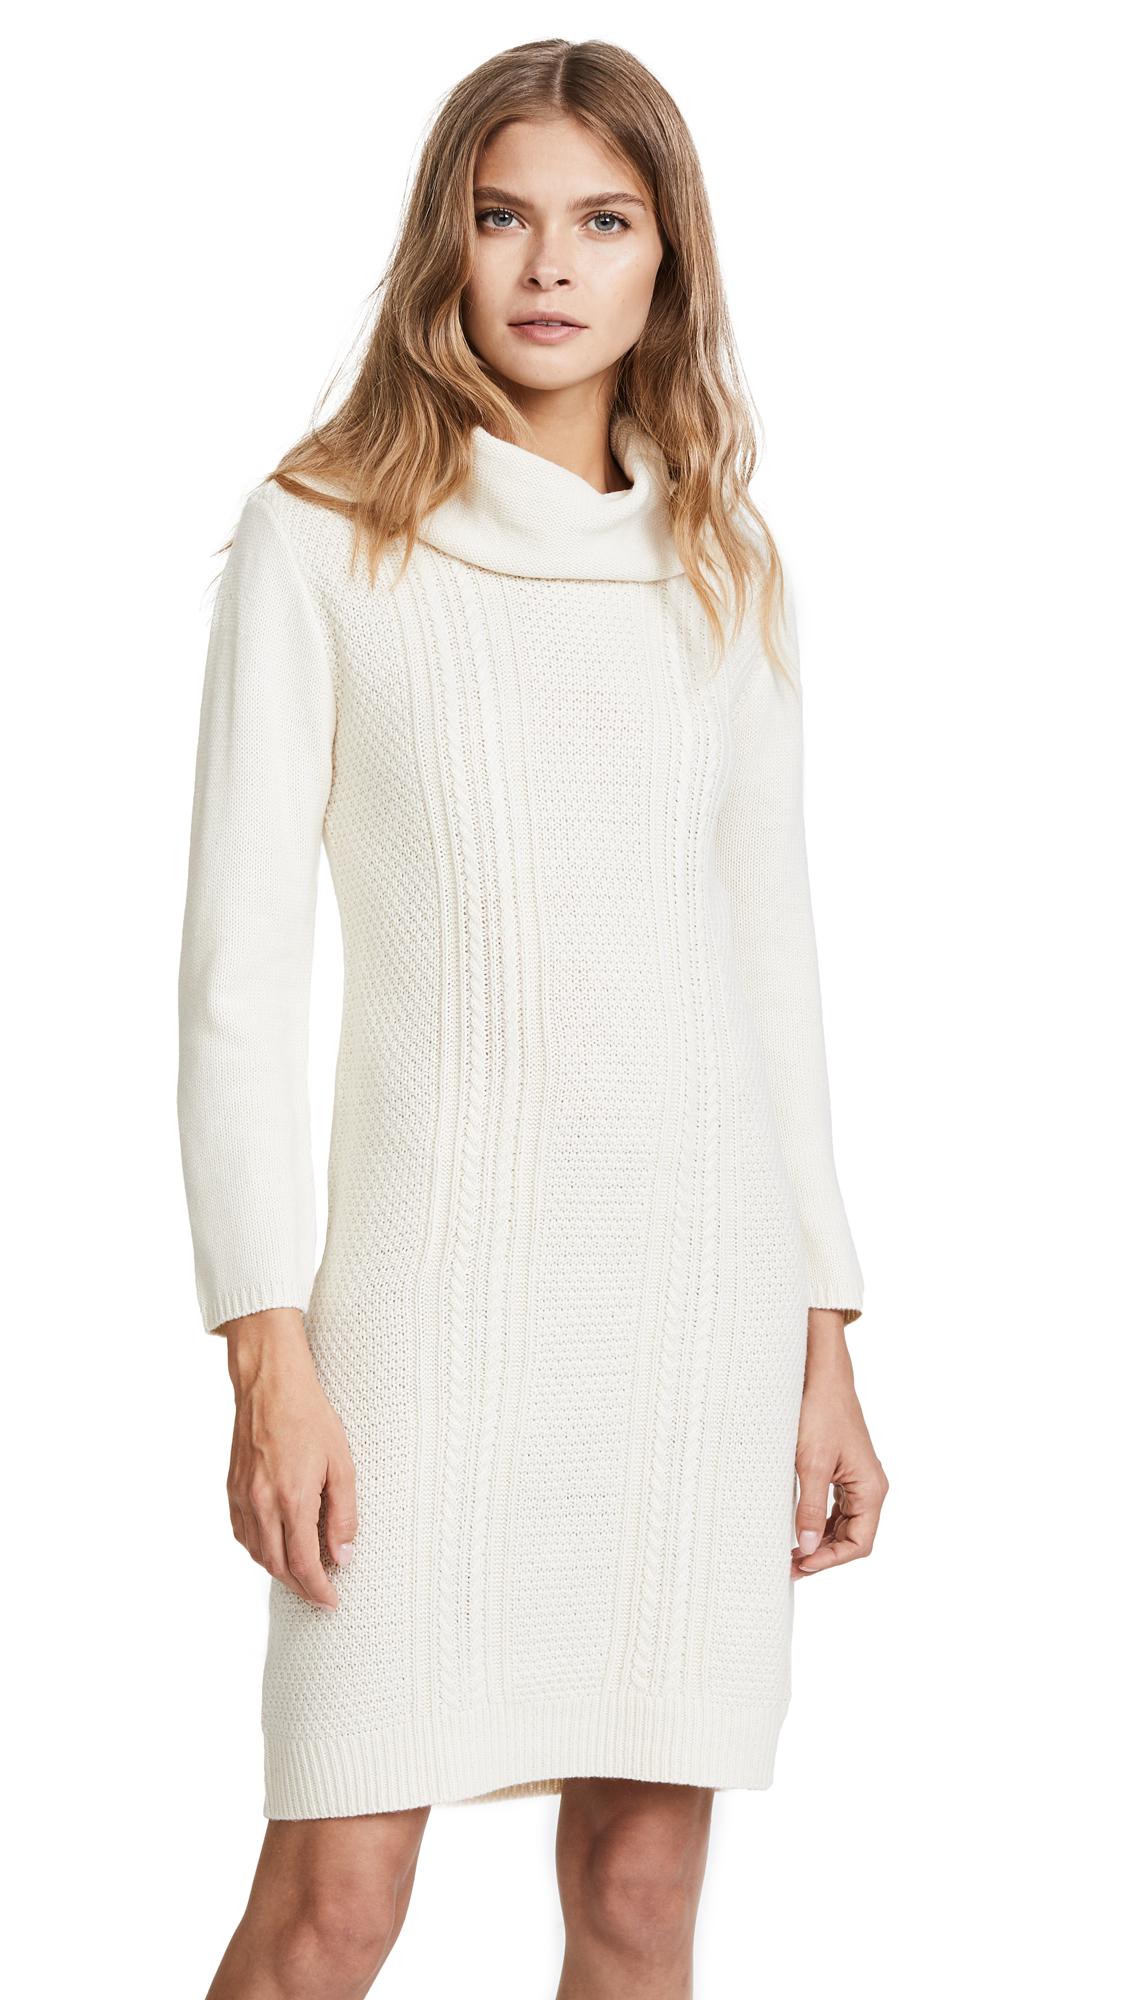 BB Dakota Jack By BB Dakota Amory Sweater Dress - Ivory